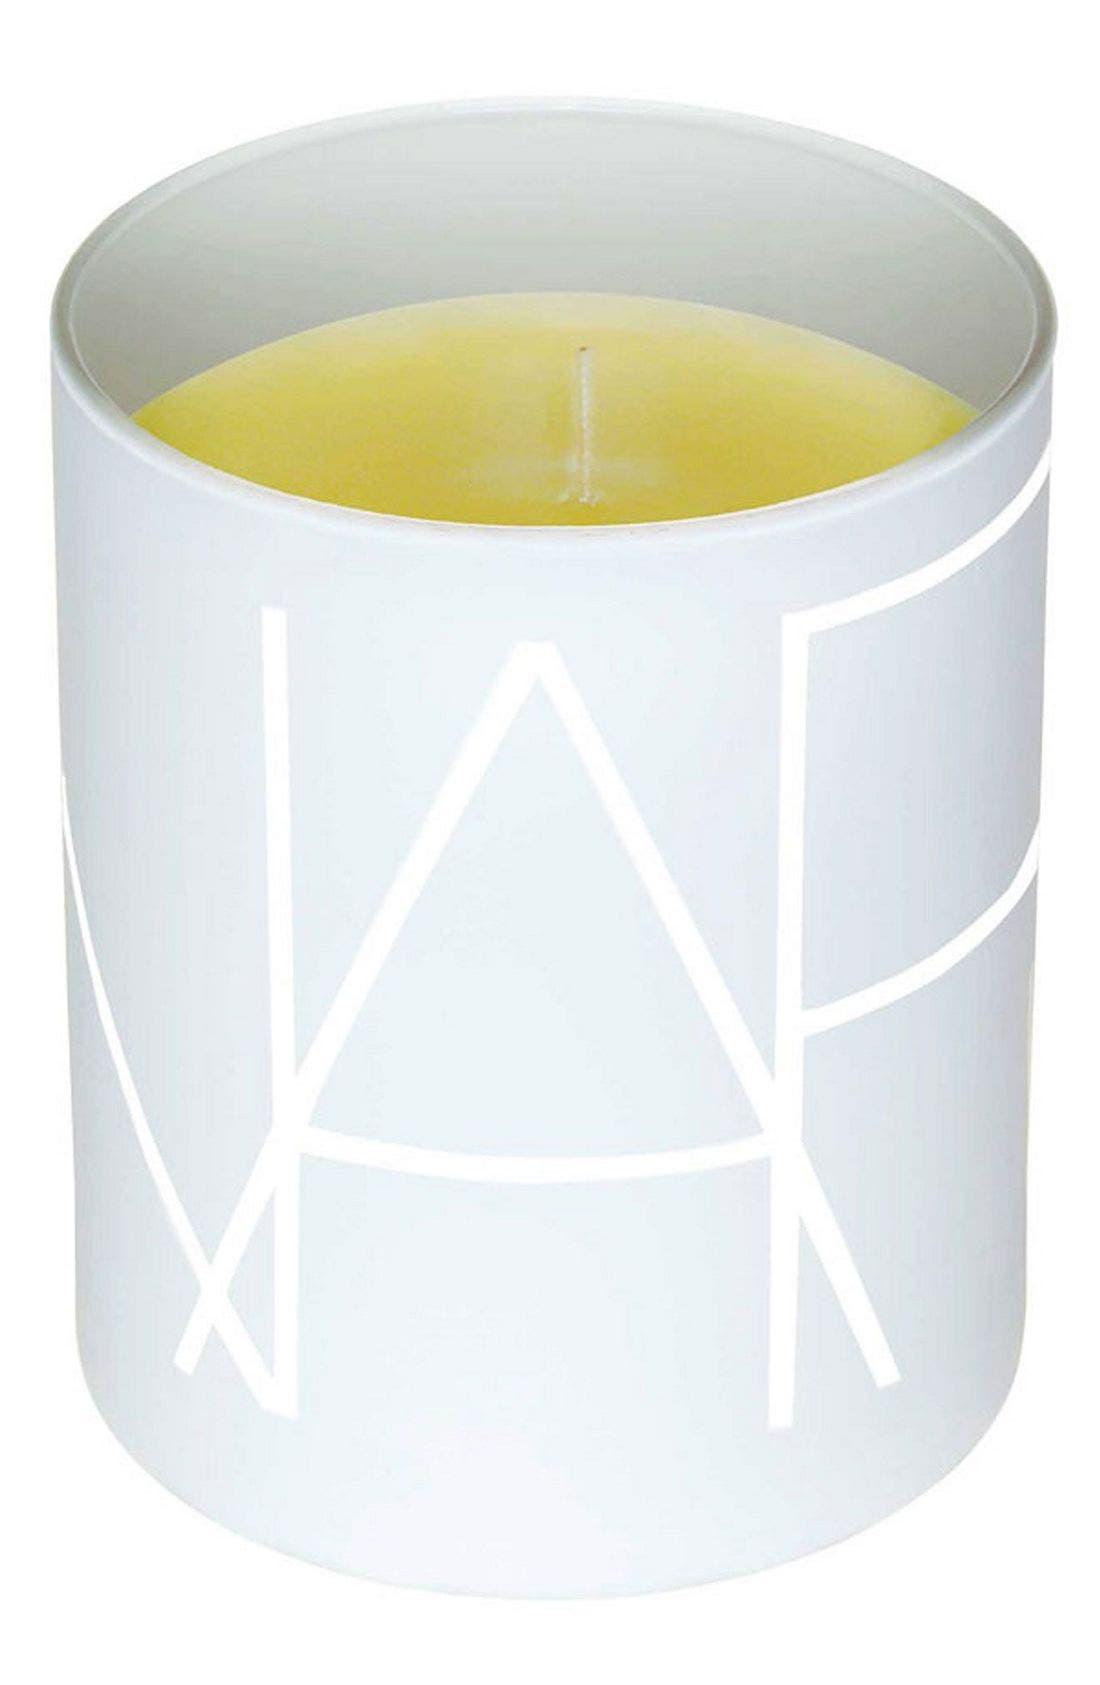 Alternate Image 1 Selected - NARS 'Oran' Candle